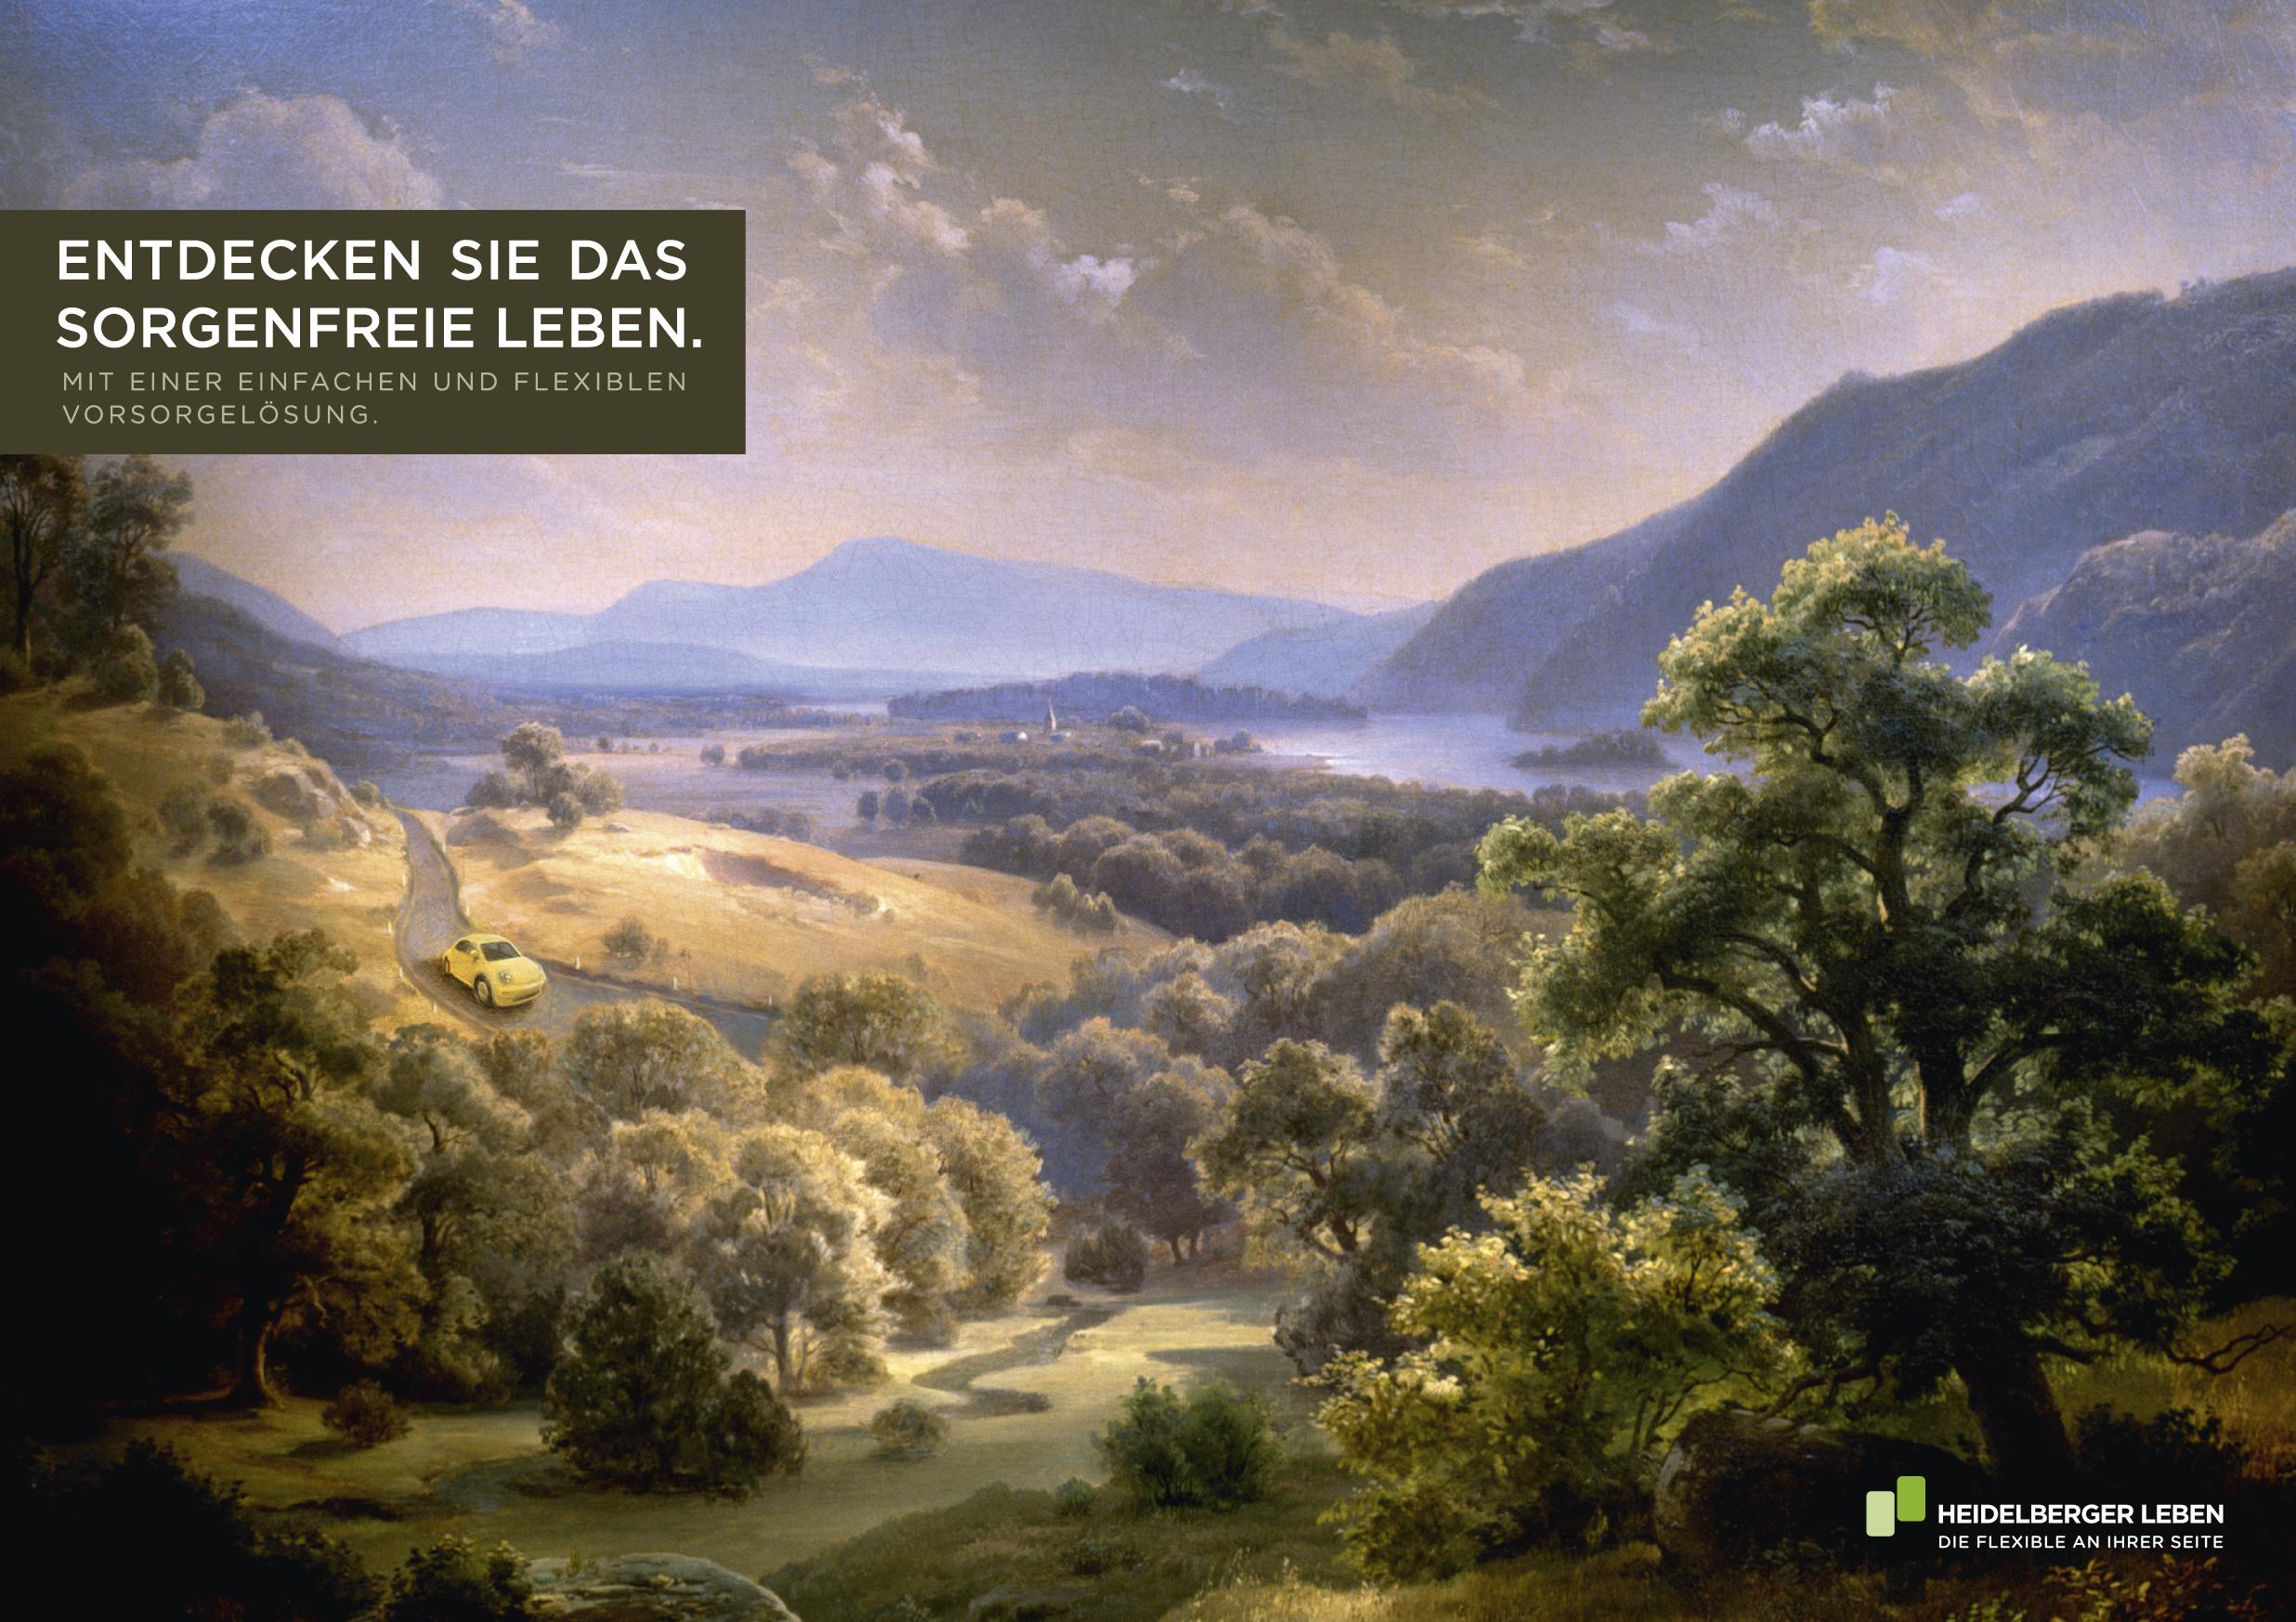 Schoener-Leben-Kaefer